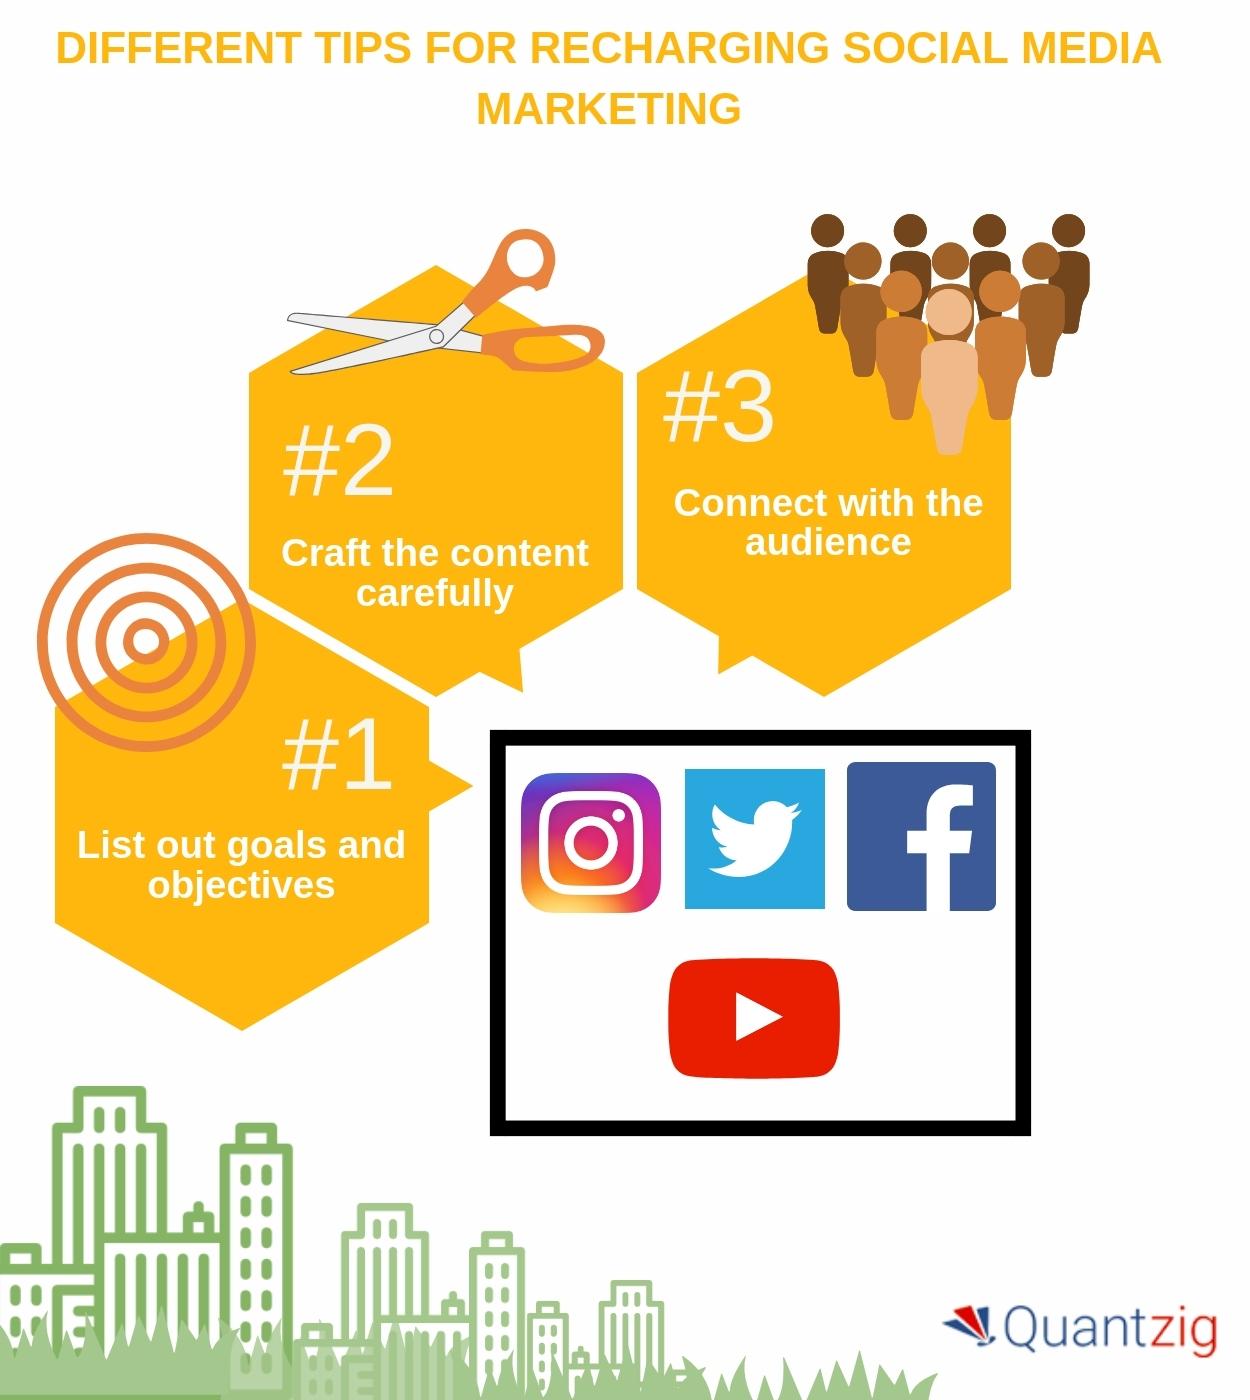 DIFFERENT_TIPS_FOR_SOCIAL_MEDIA_MARKETING.jpg (1250×1400)